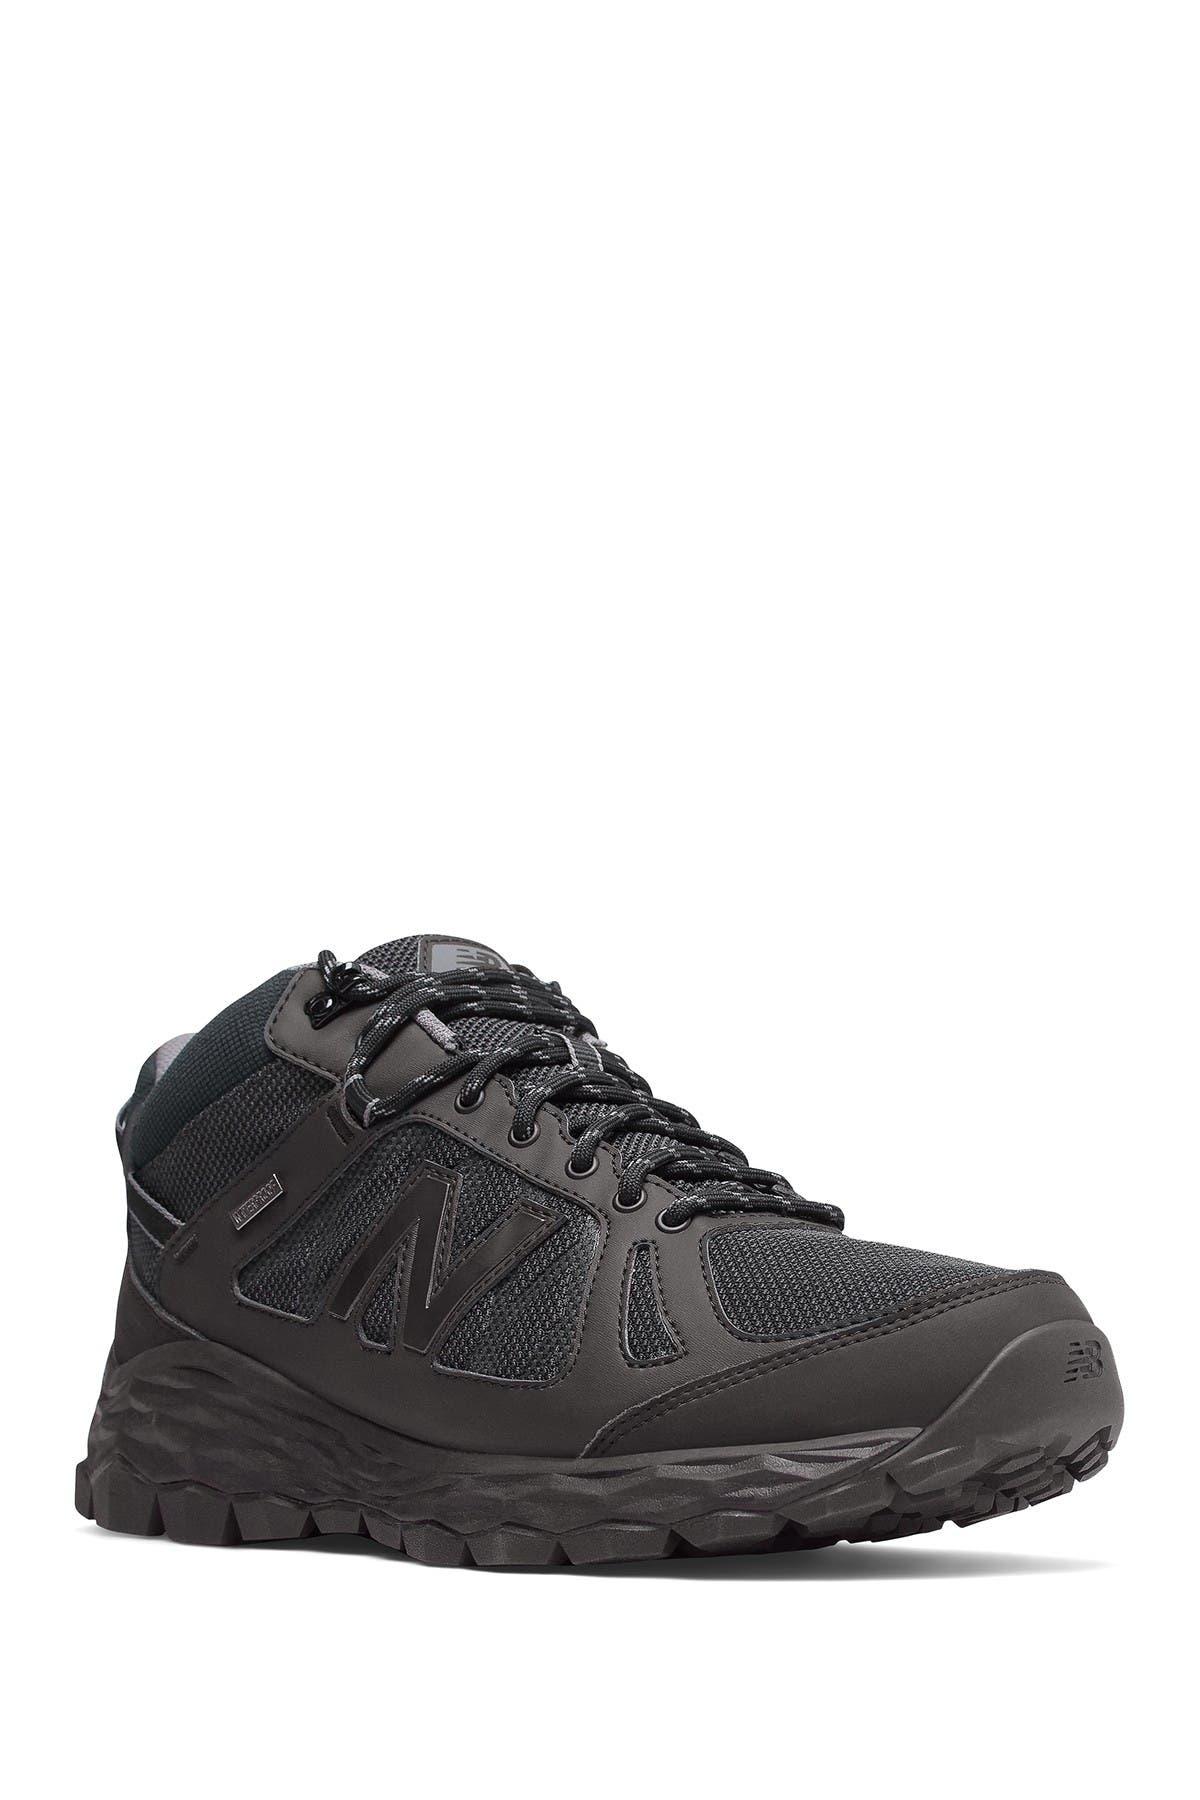 New Balance | 1450 Outdoor Walking Shoe